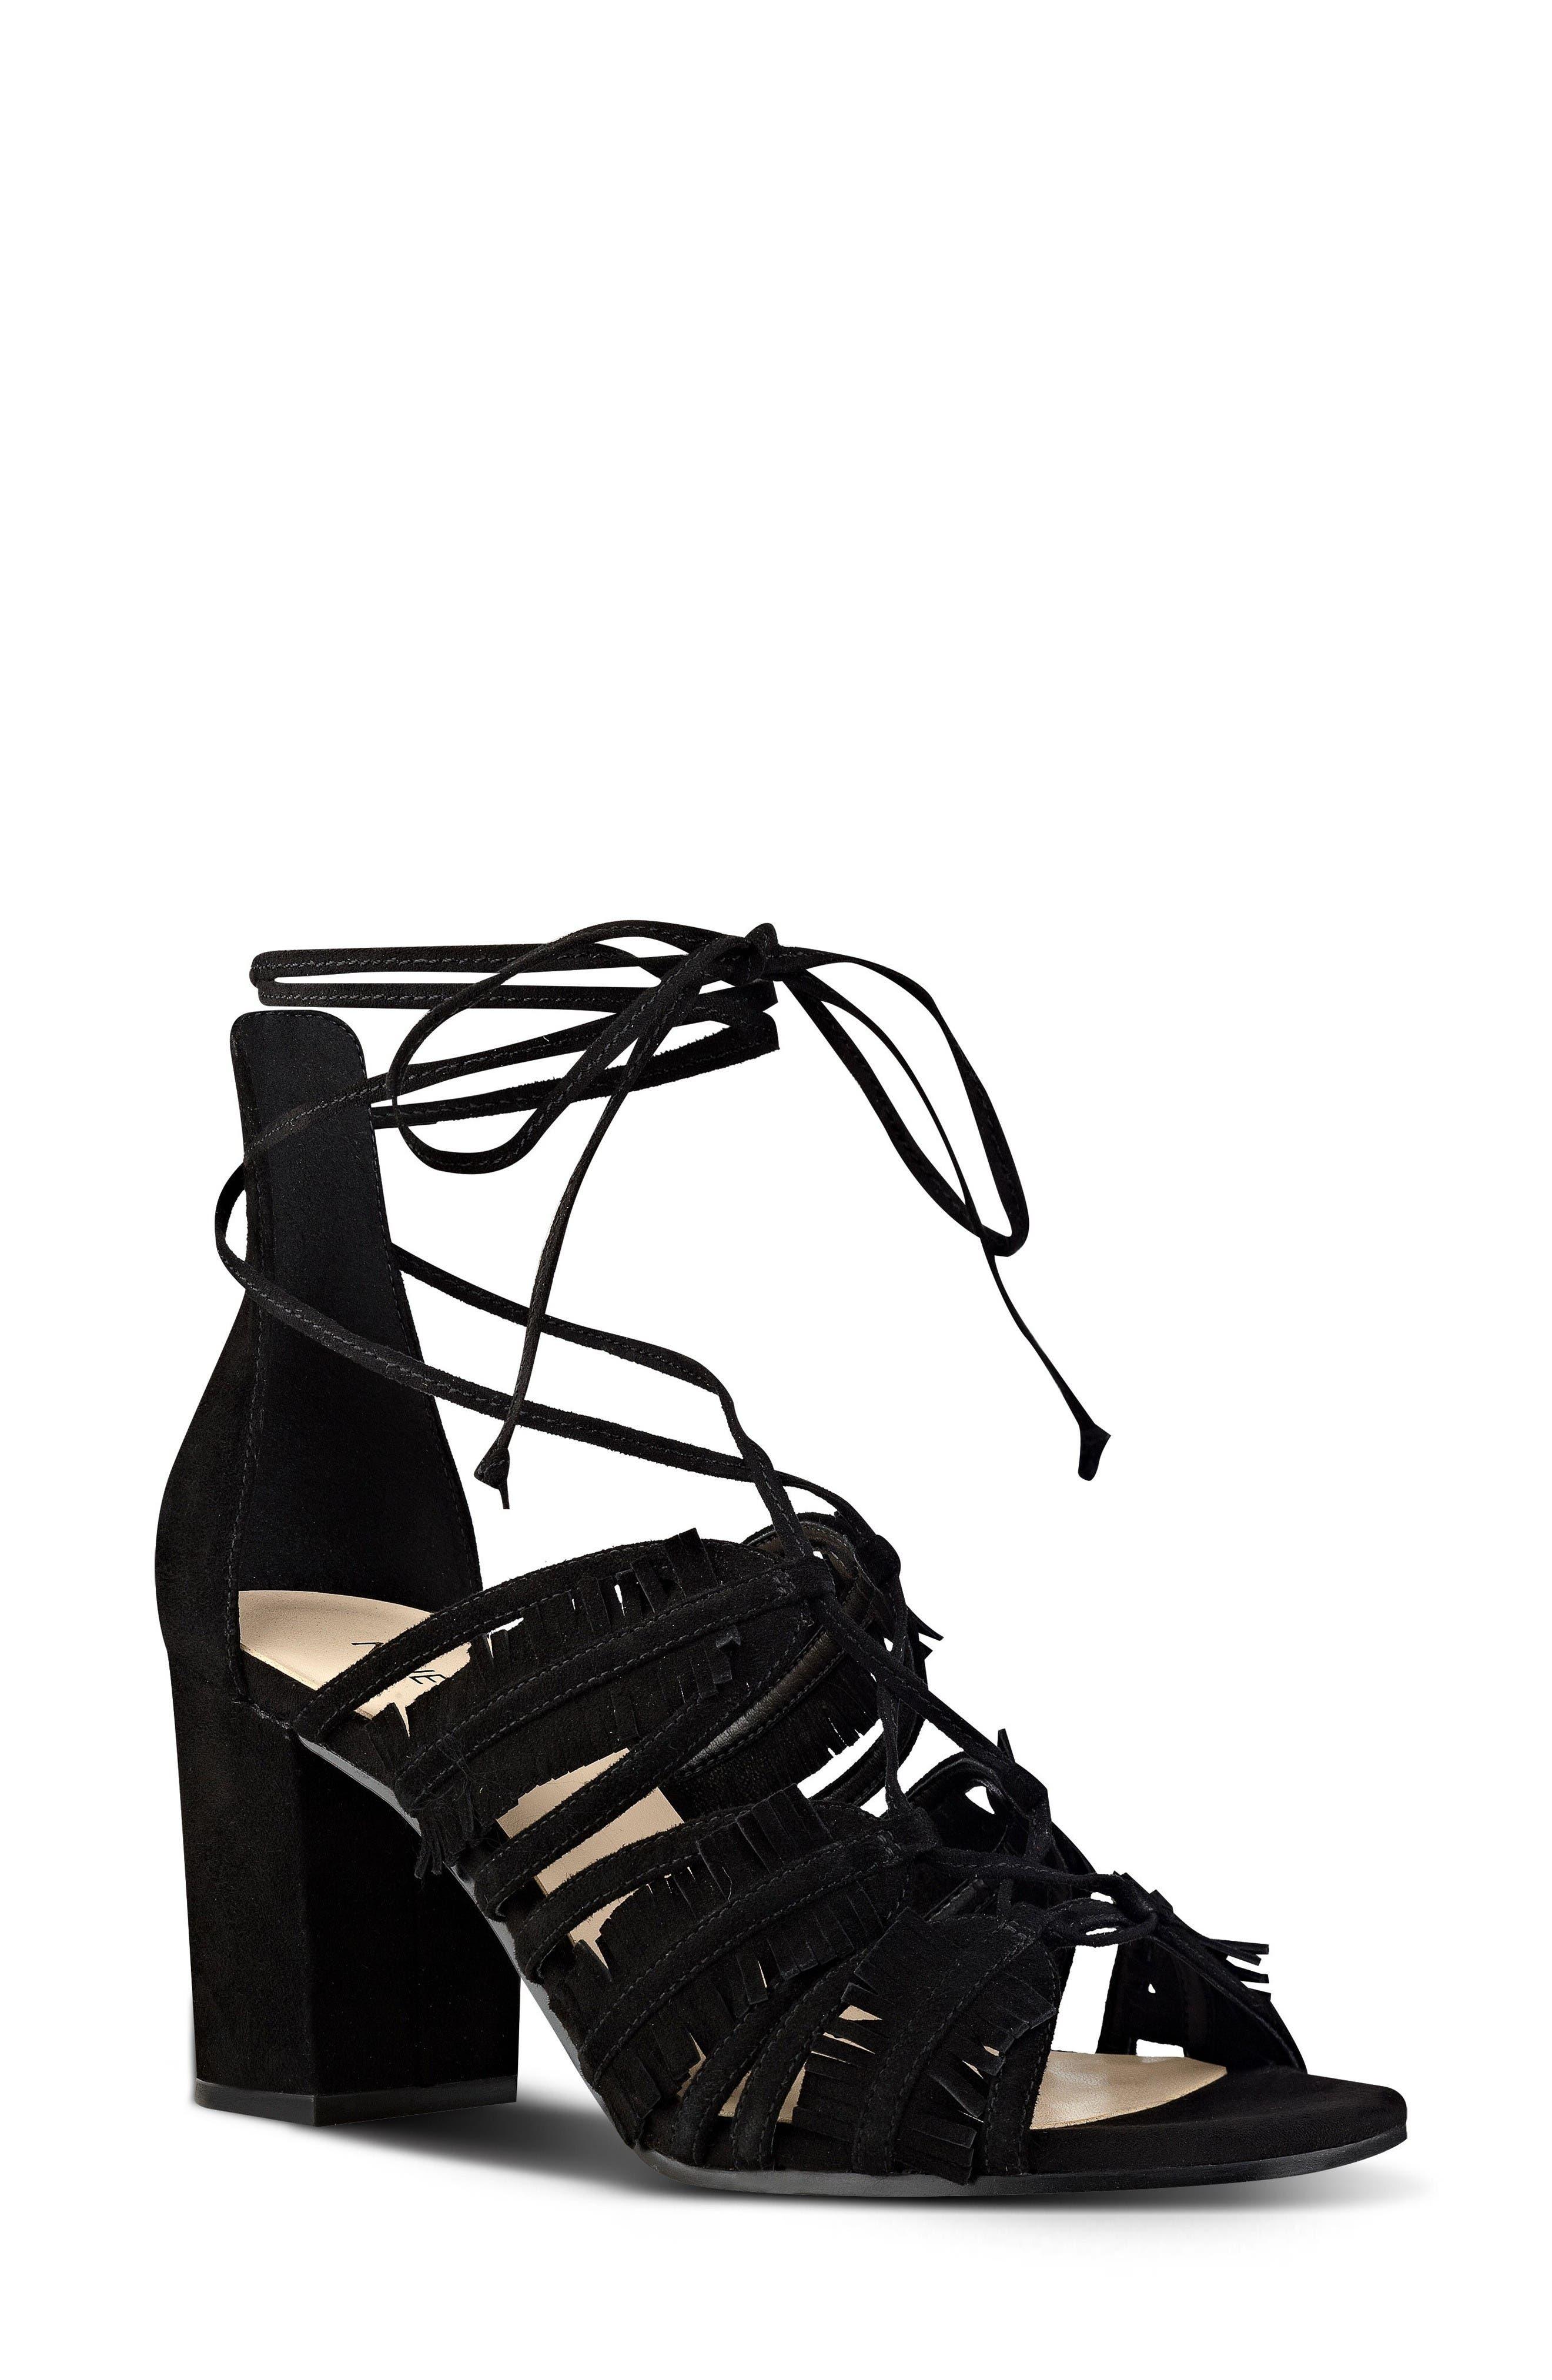 Alternate Image 1 Selected - Nine West Genie Lace-Up Sandal (Women)